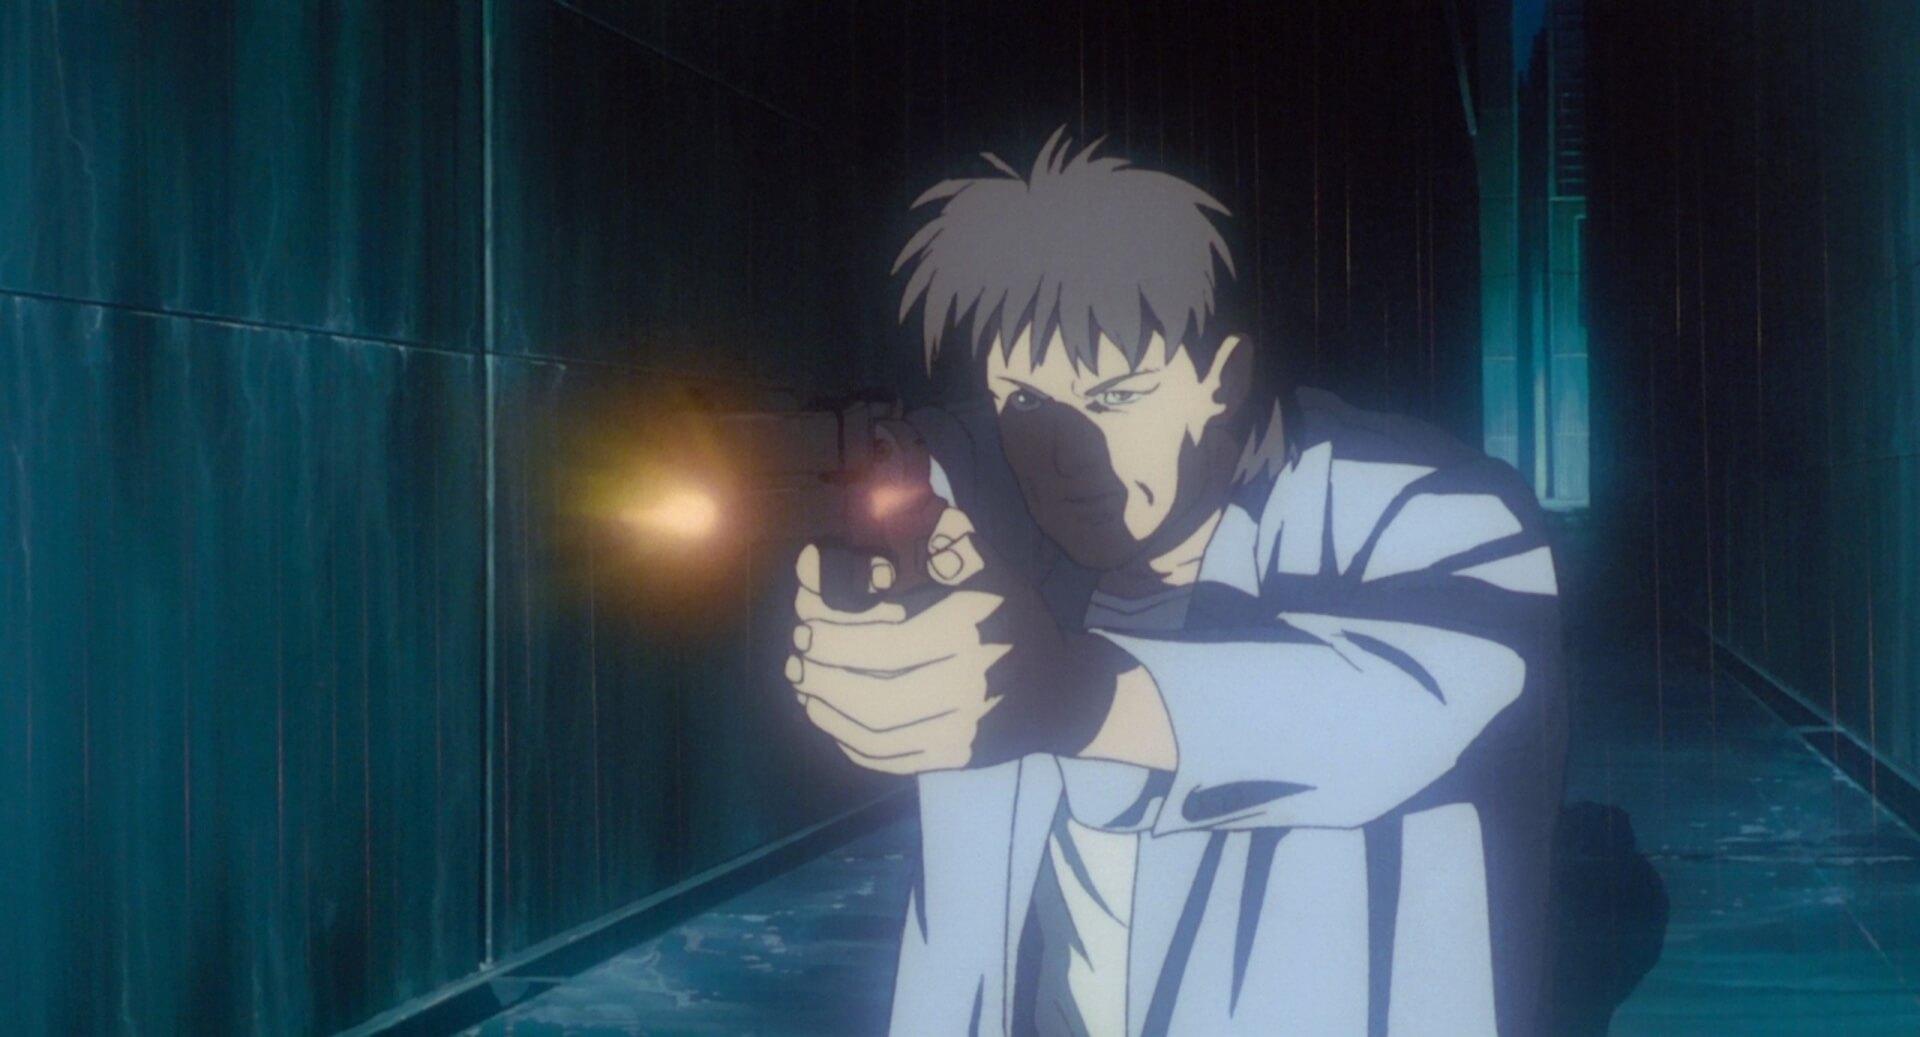 『GHOST IN THE SHELL/攻殻機動隊 4Kリマスター版』がIMAX&通常上映決定!押井守からのコメントも film210820_ghostintheshell_imax_5